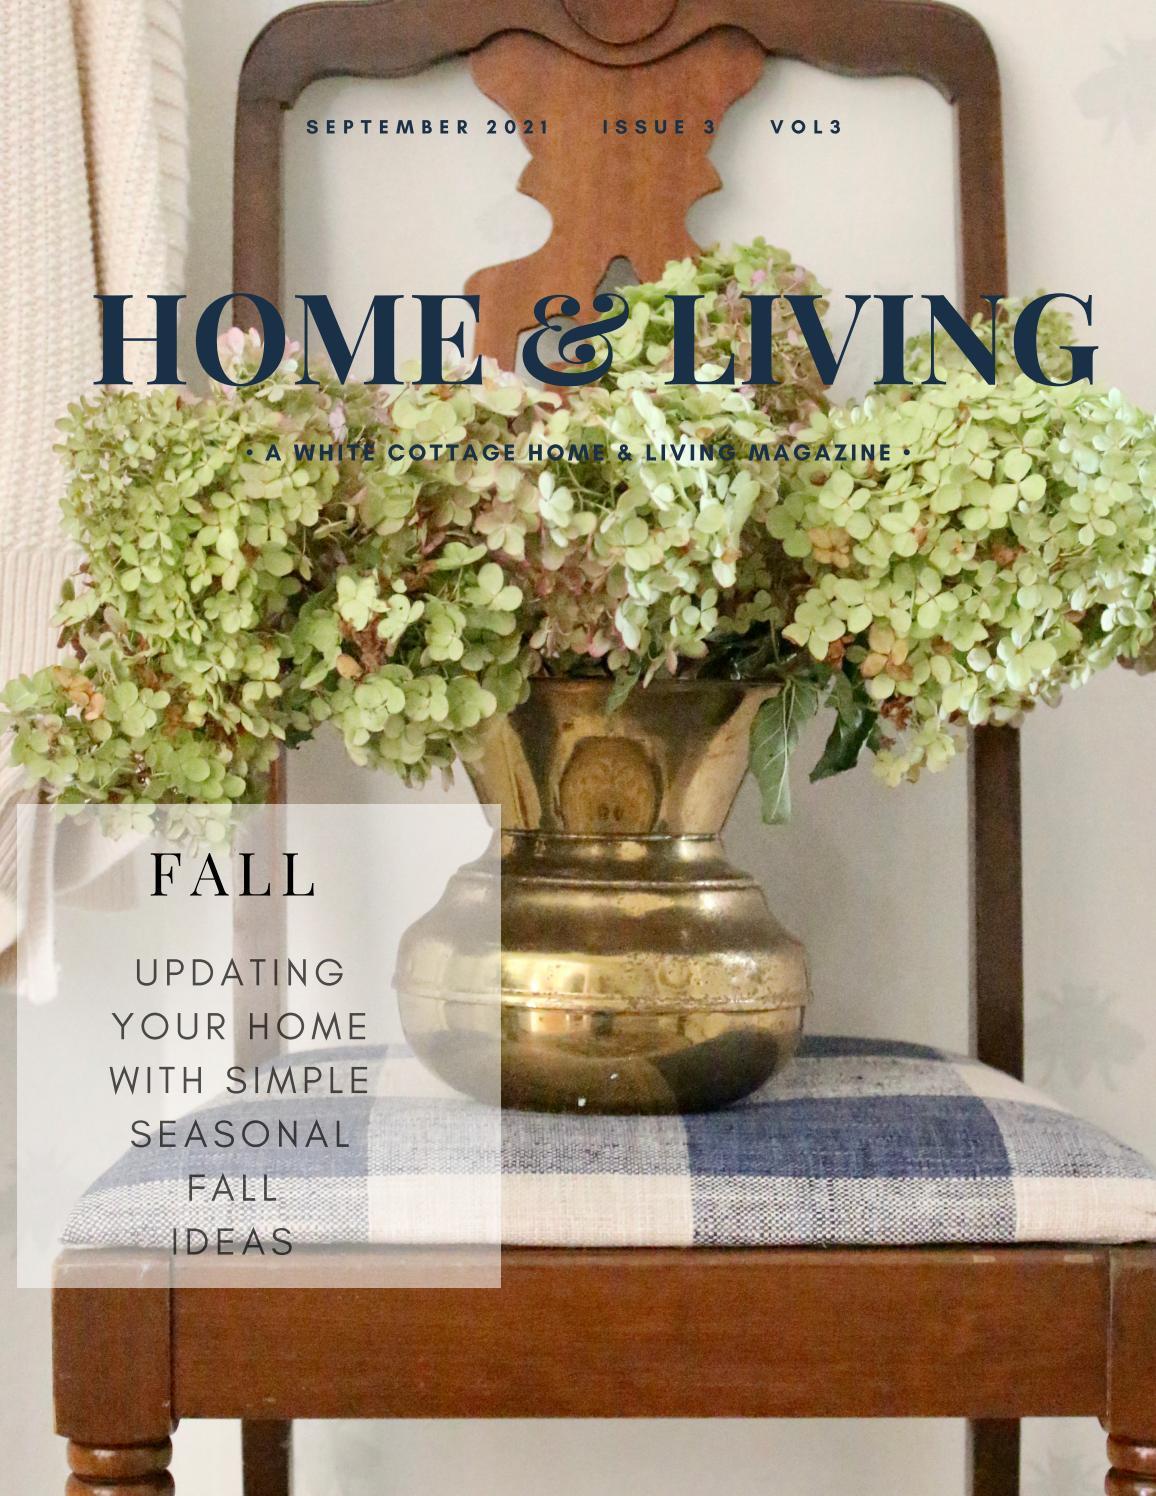 Home & Living Magazine Fall 2021